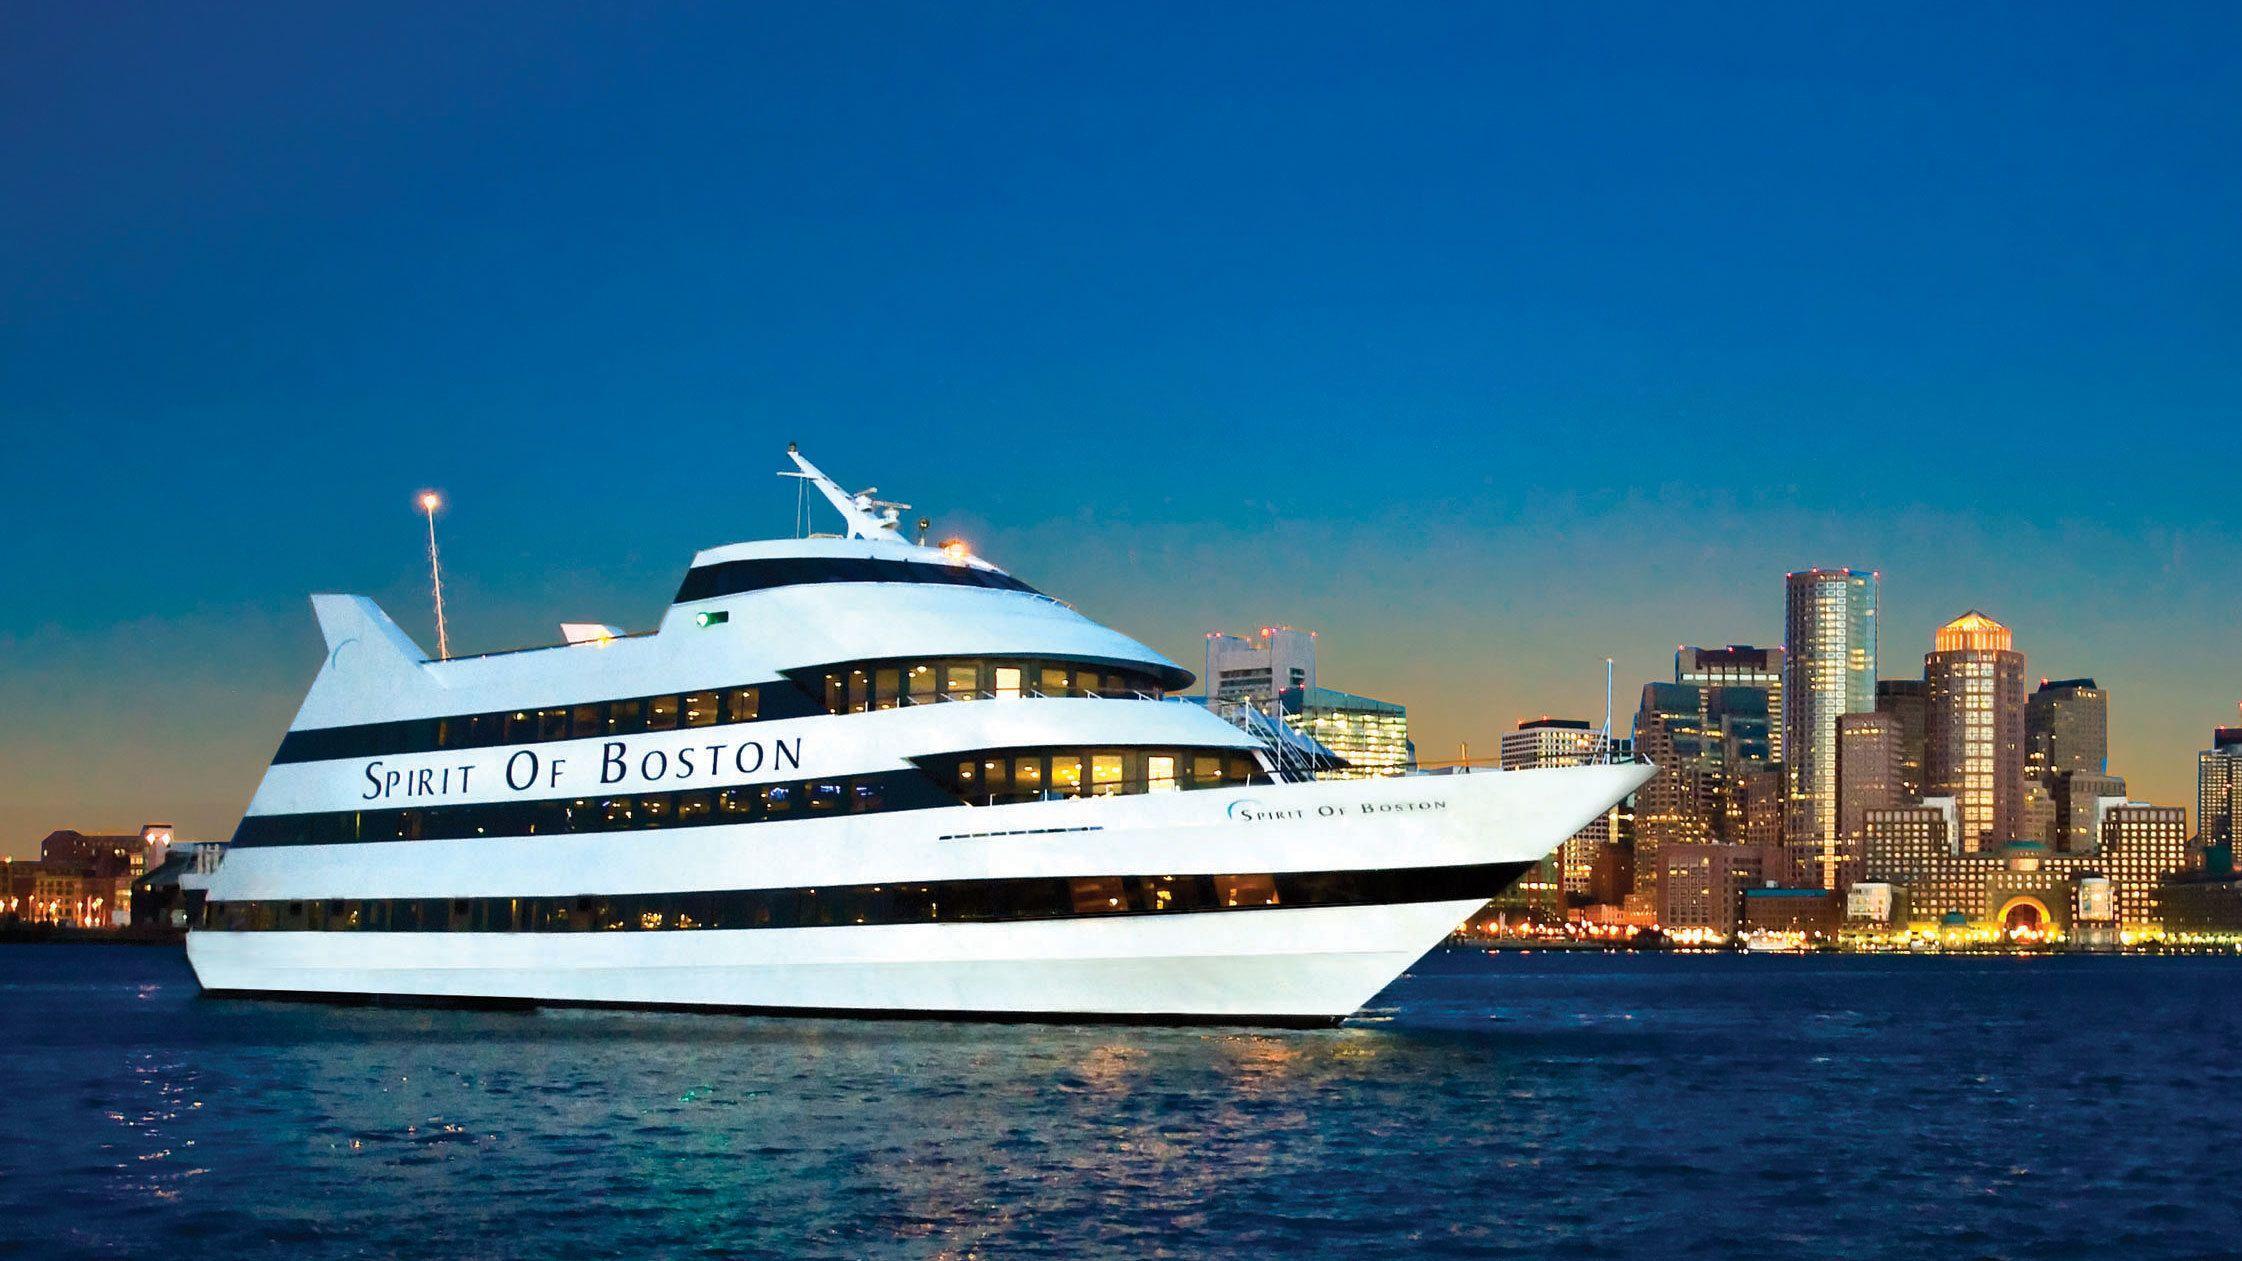 Dinner Cruise aboard the Spirit of Boston